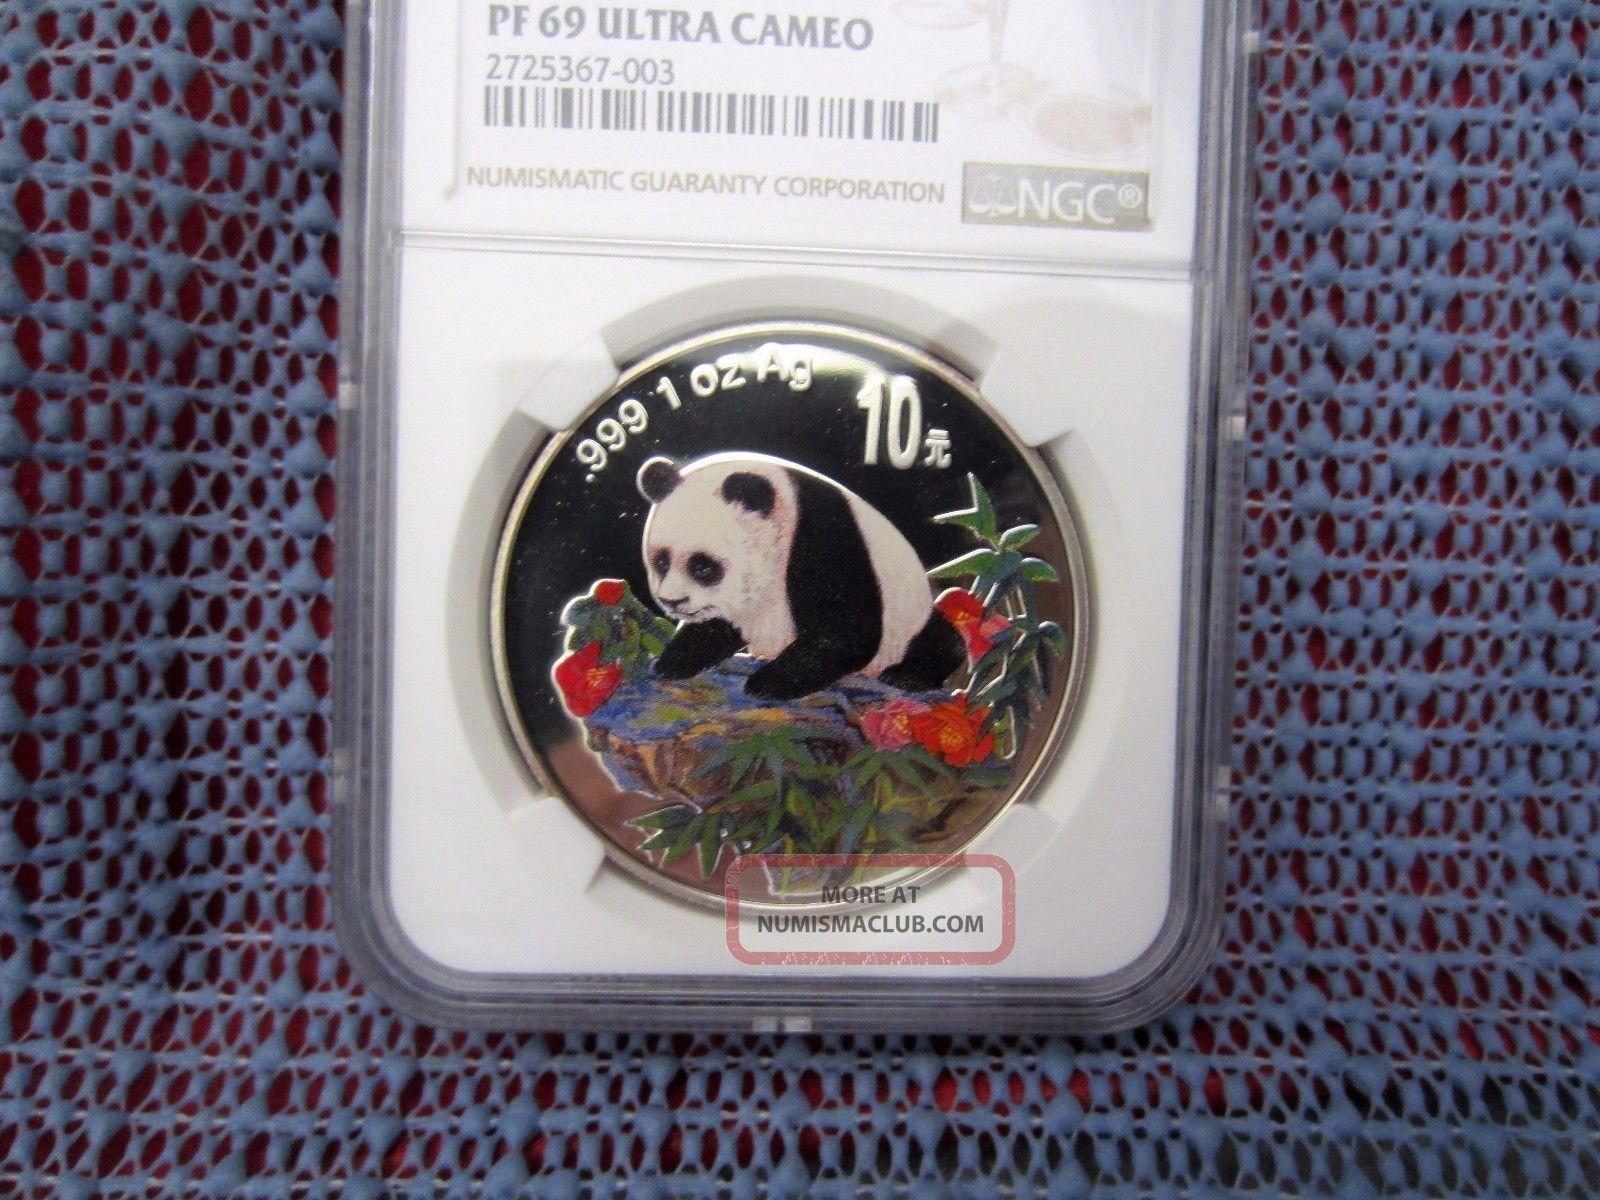 1999 China Panda 10 Yuan 1oz Silver Colorized Ncs / Ngc Pf69uc PRC (1949-Now) photo